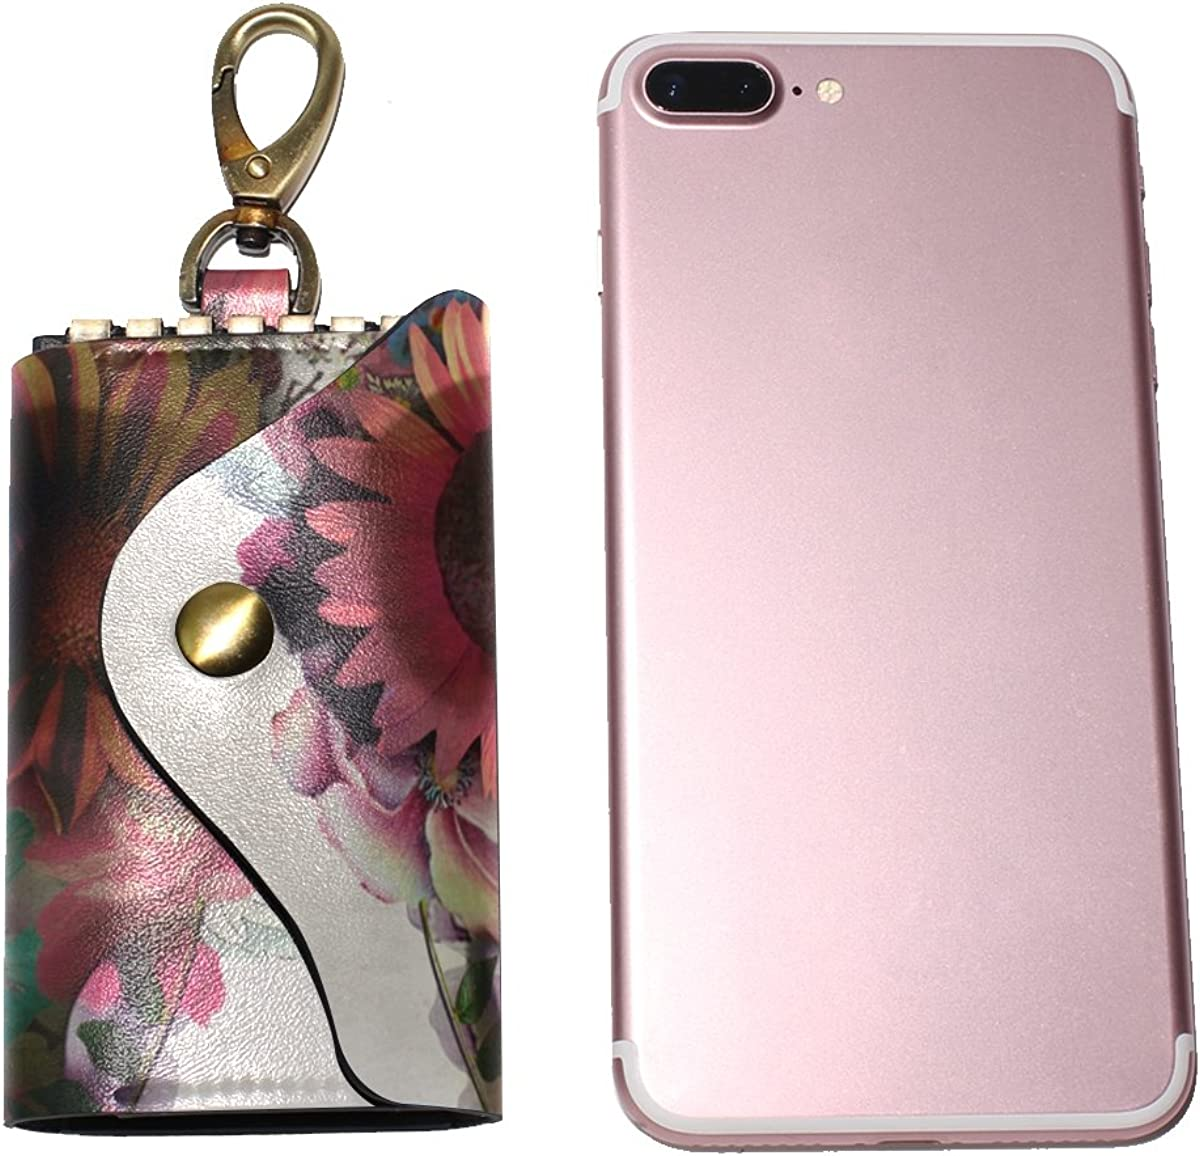 DEYYA Skull Leather Key Case Wallets Unisex Keychain Key Holder with 6 Hooks Snap Closure